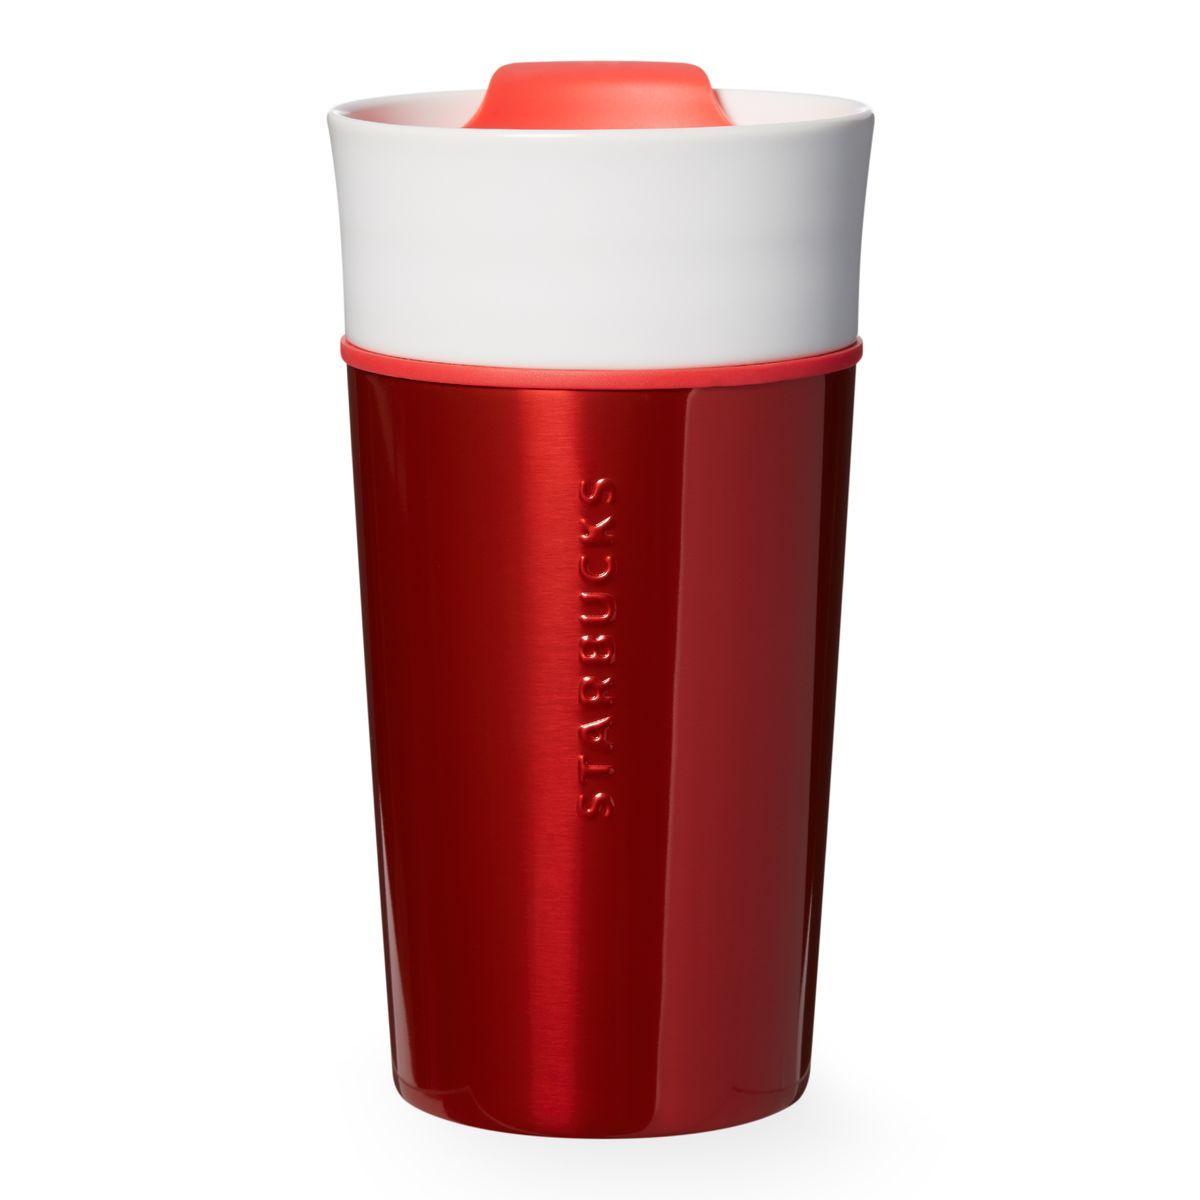 Stainless Ceramic Mug Red 12 Fl Oz Espresso Drinks Mugs Coffee Drinks